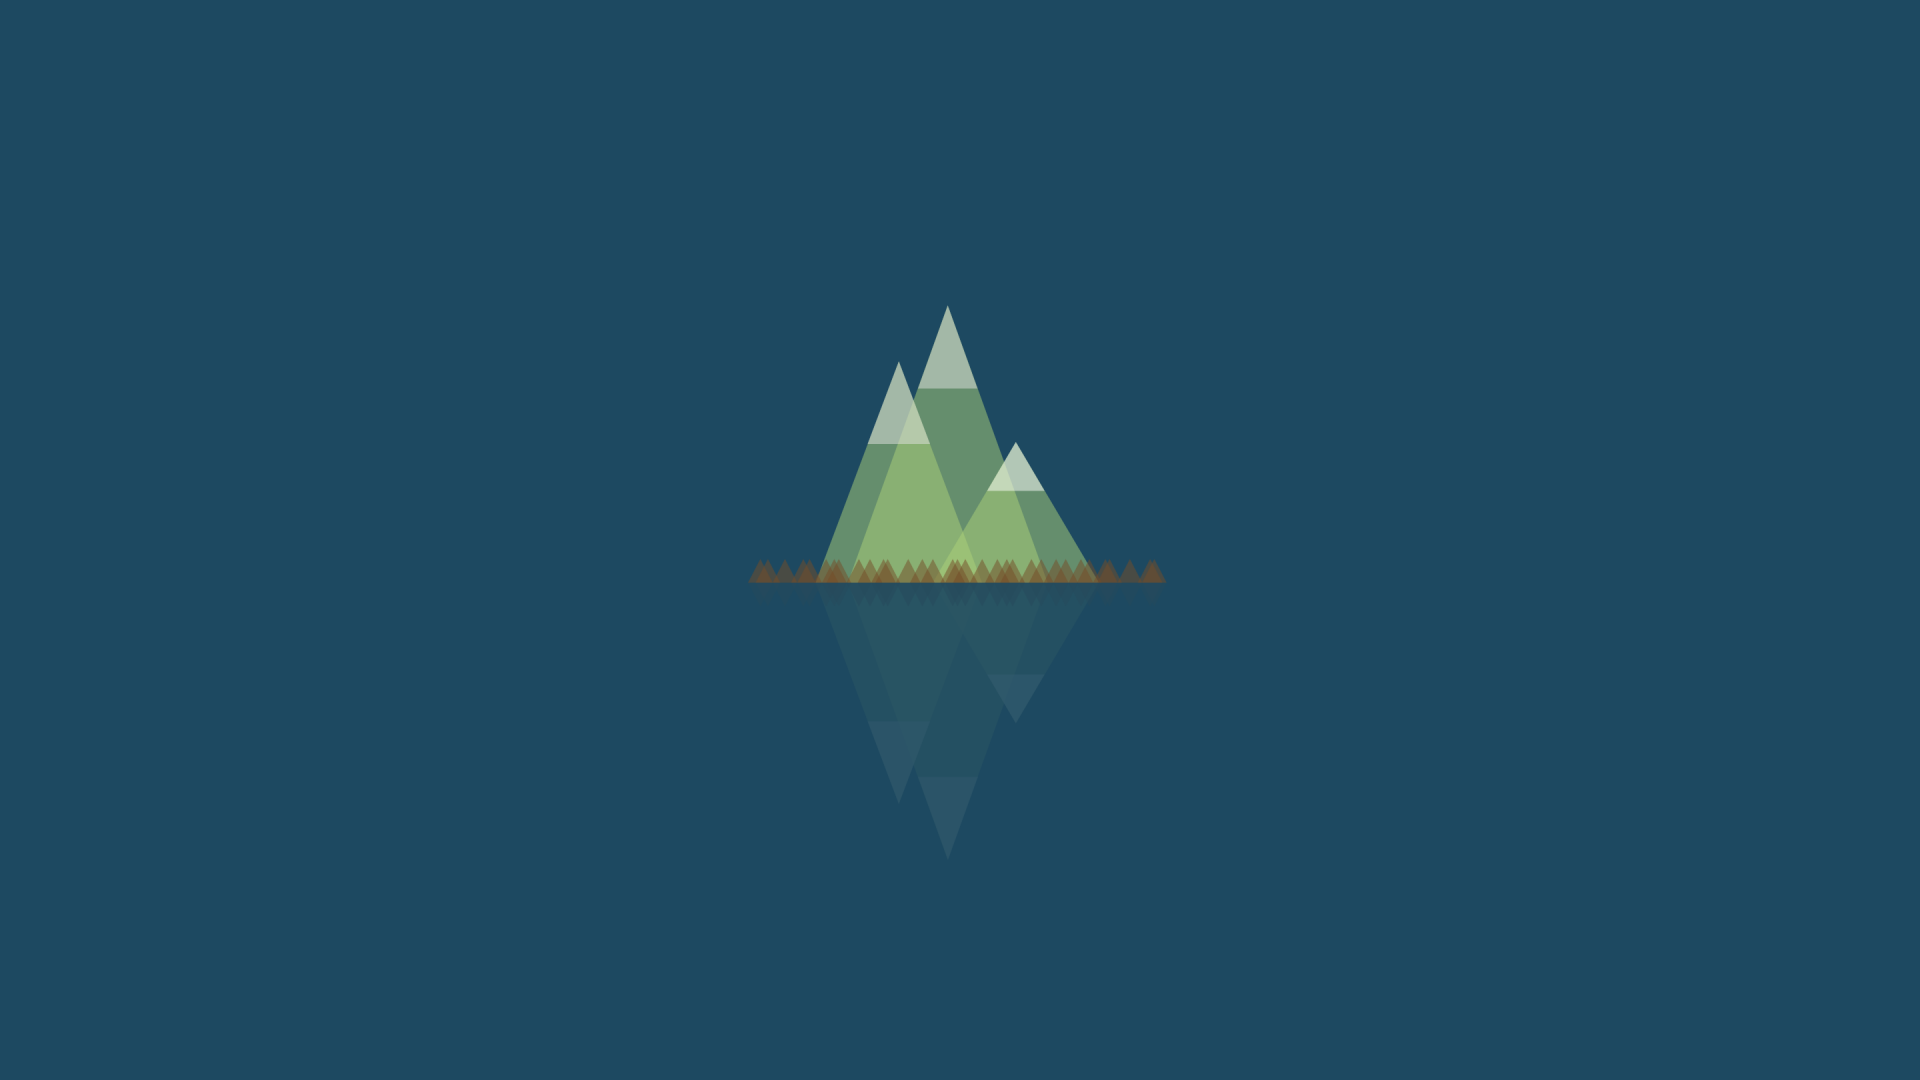 Wallpaper Mountains, reflections, nature, minimalism